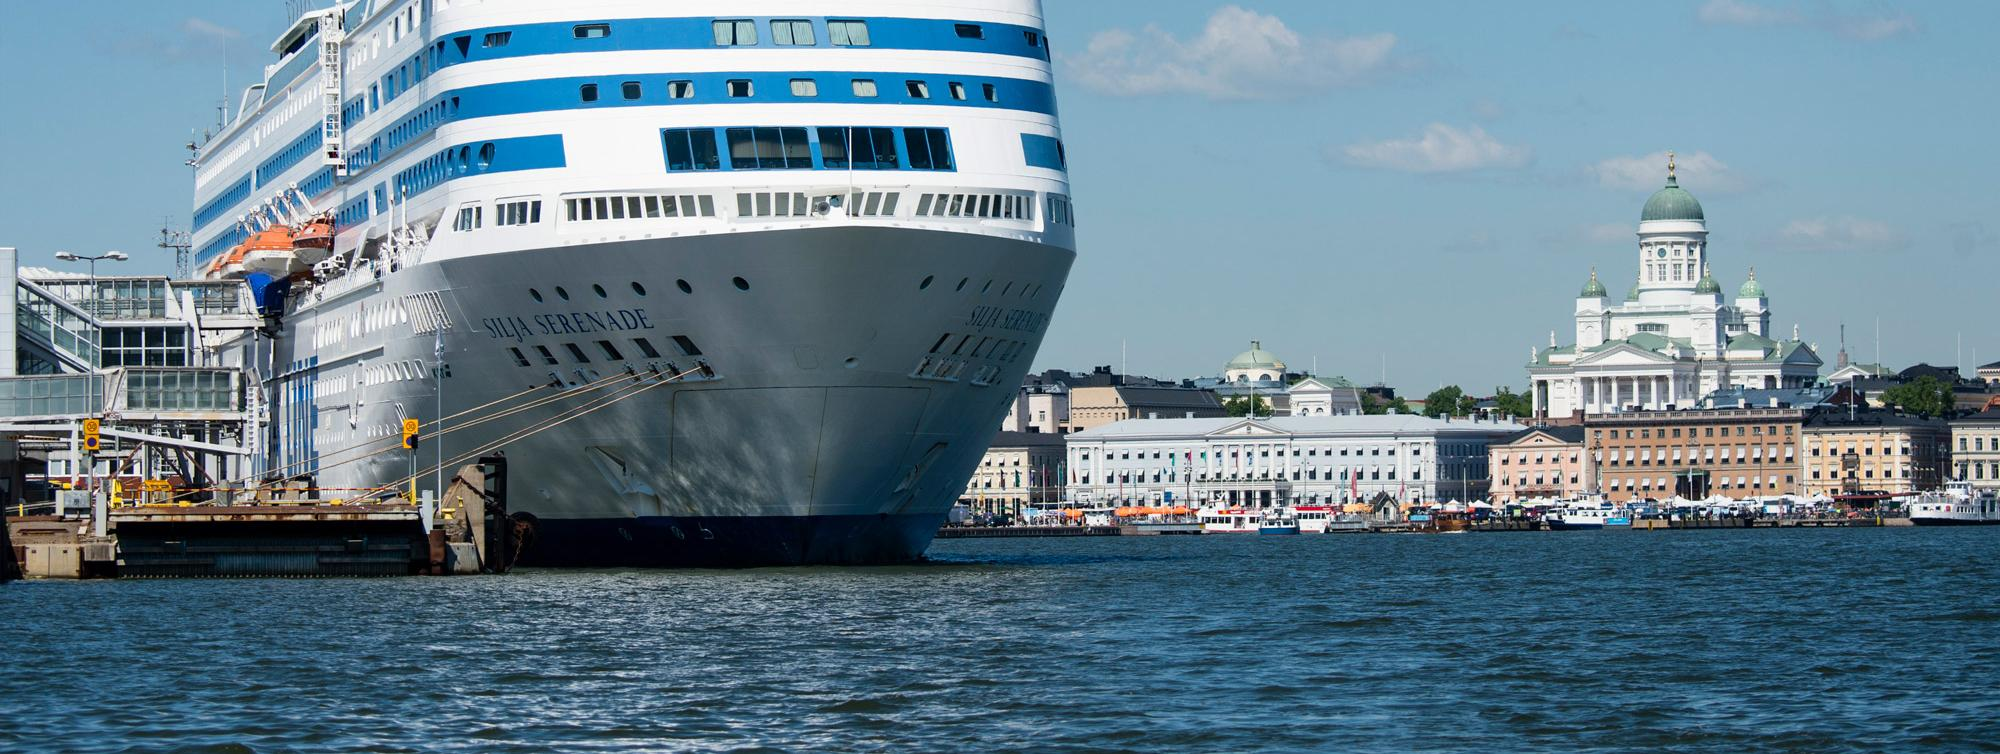 Etelasatama Port Of Helsinki